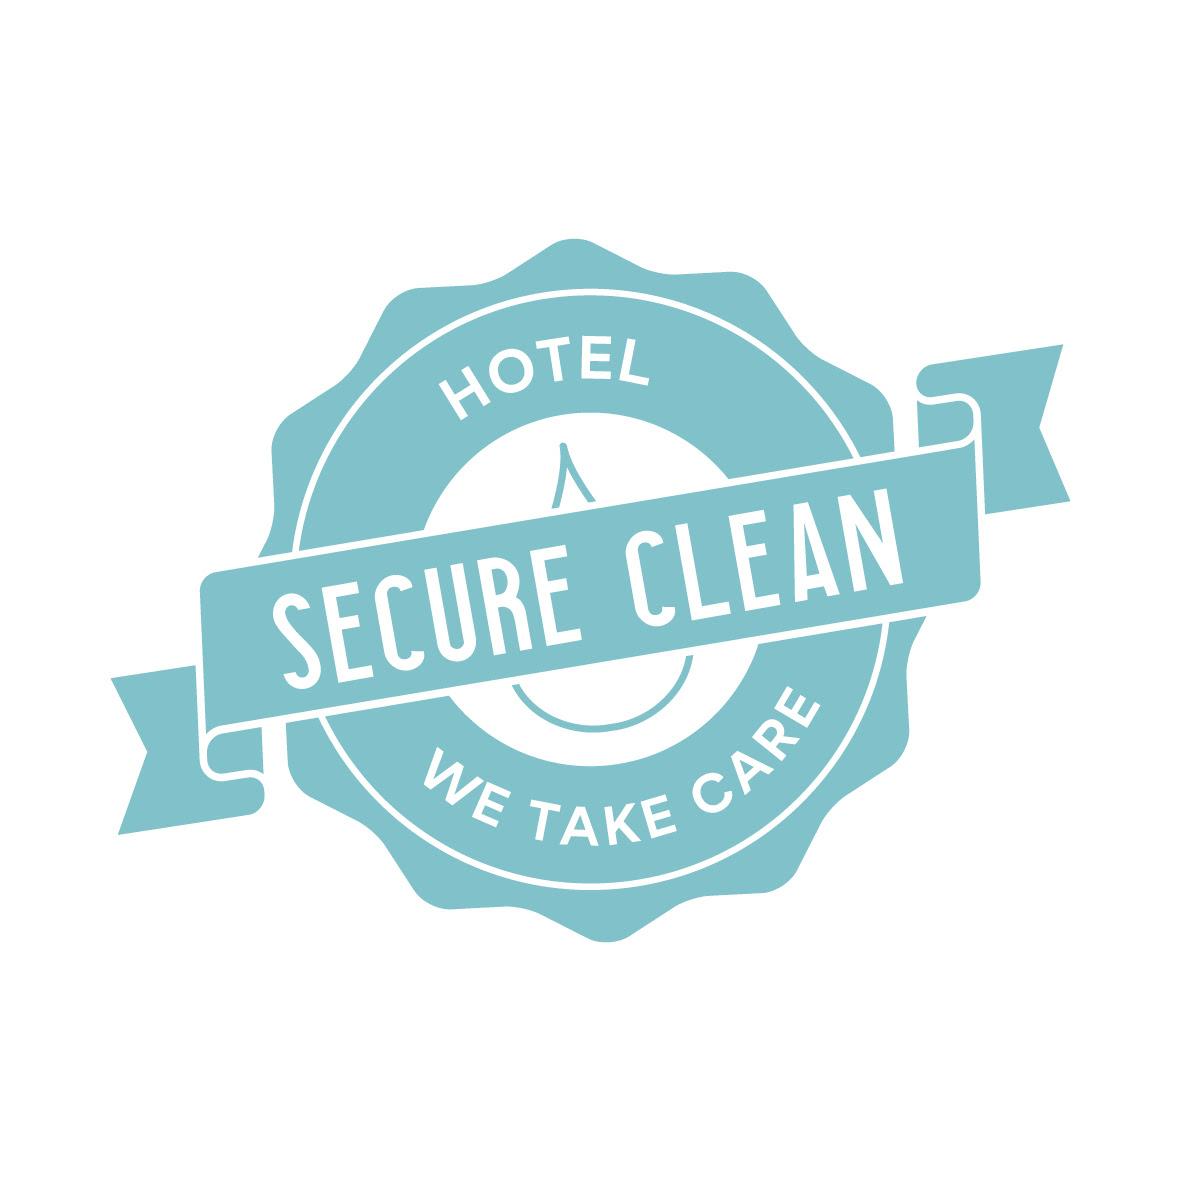 SECURE CLEAN HOTEL LIRICO